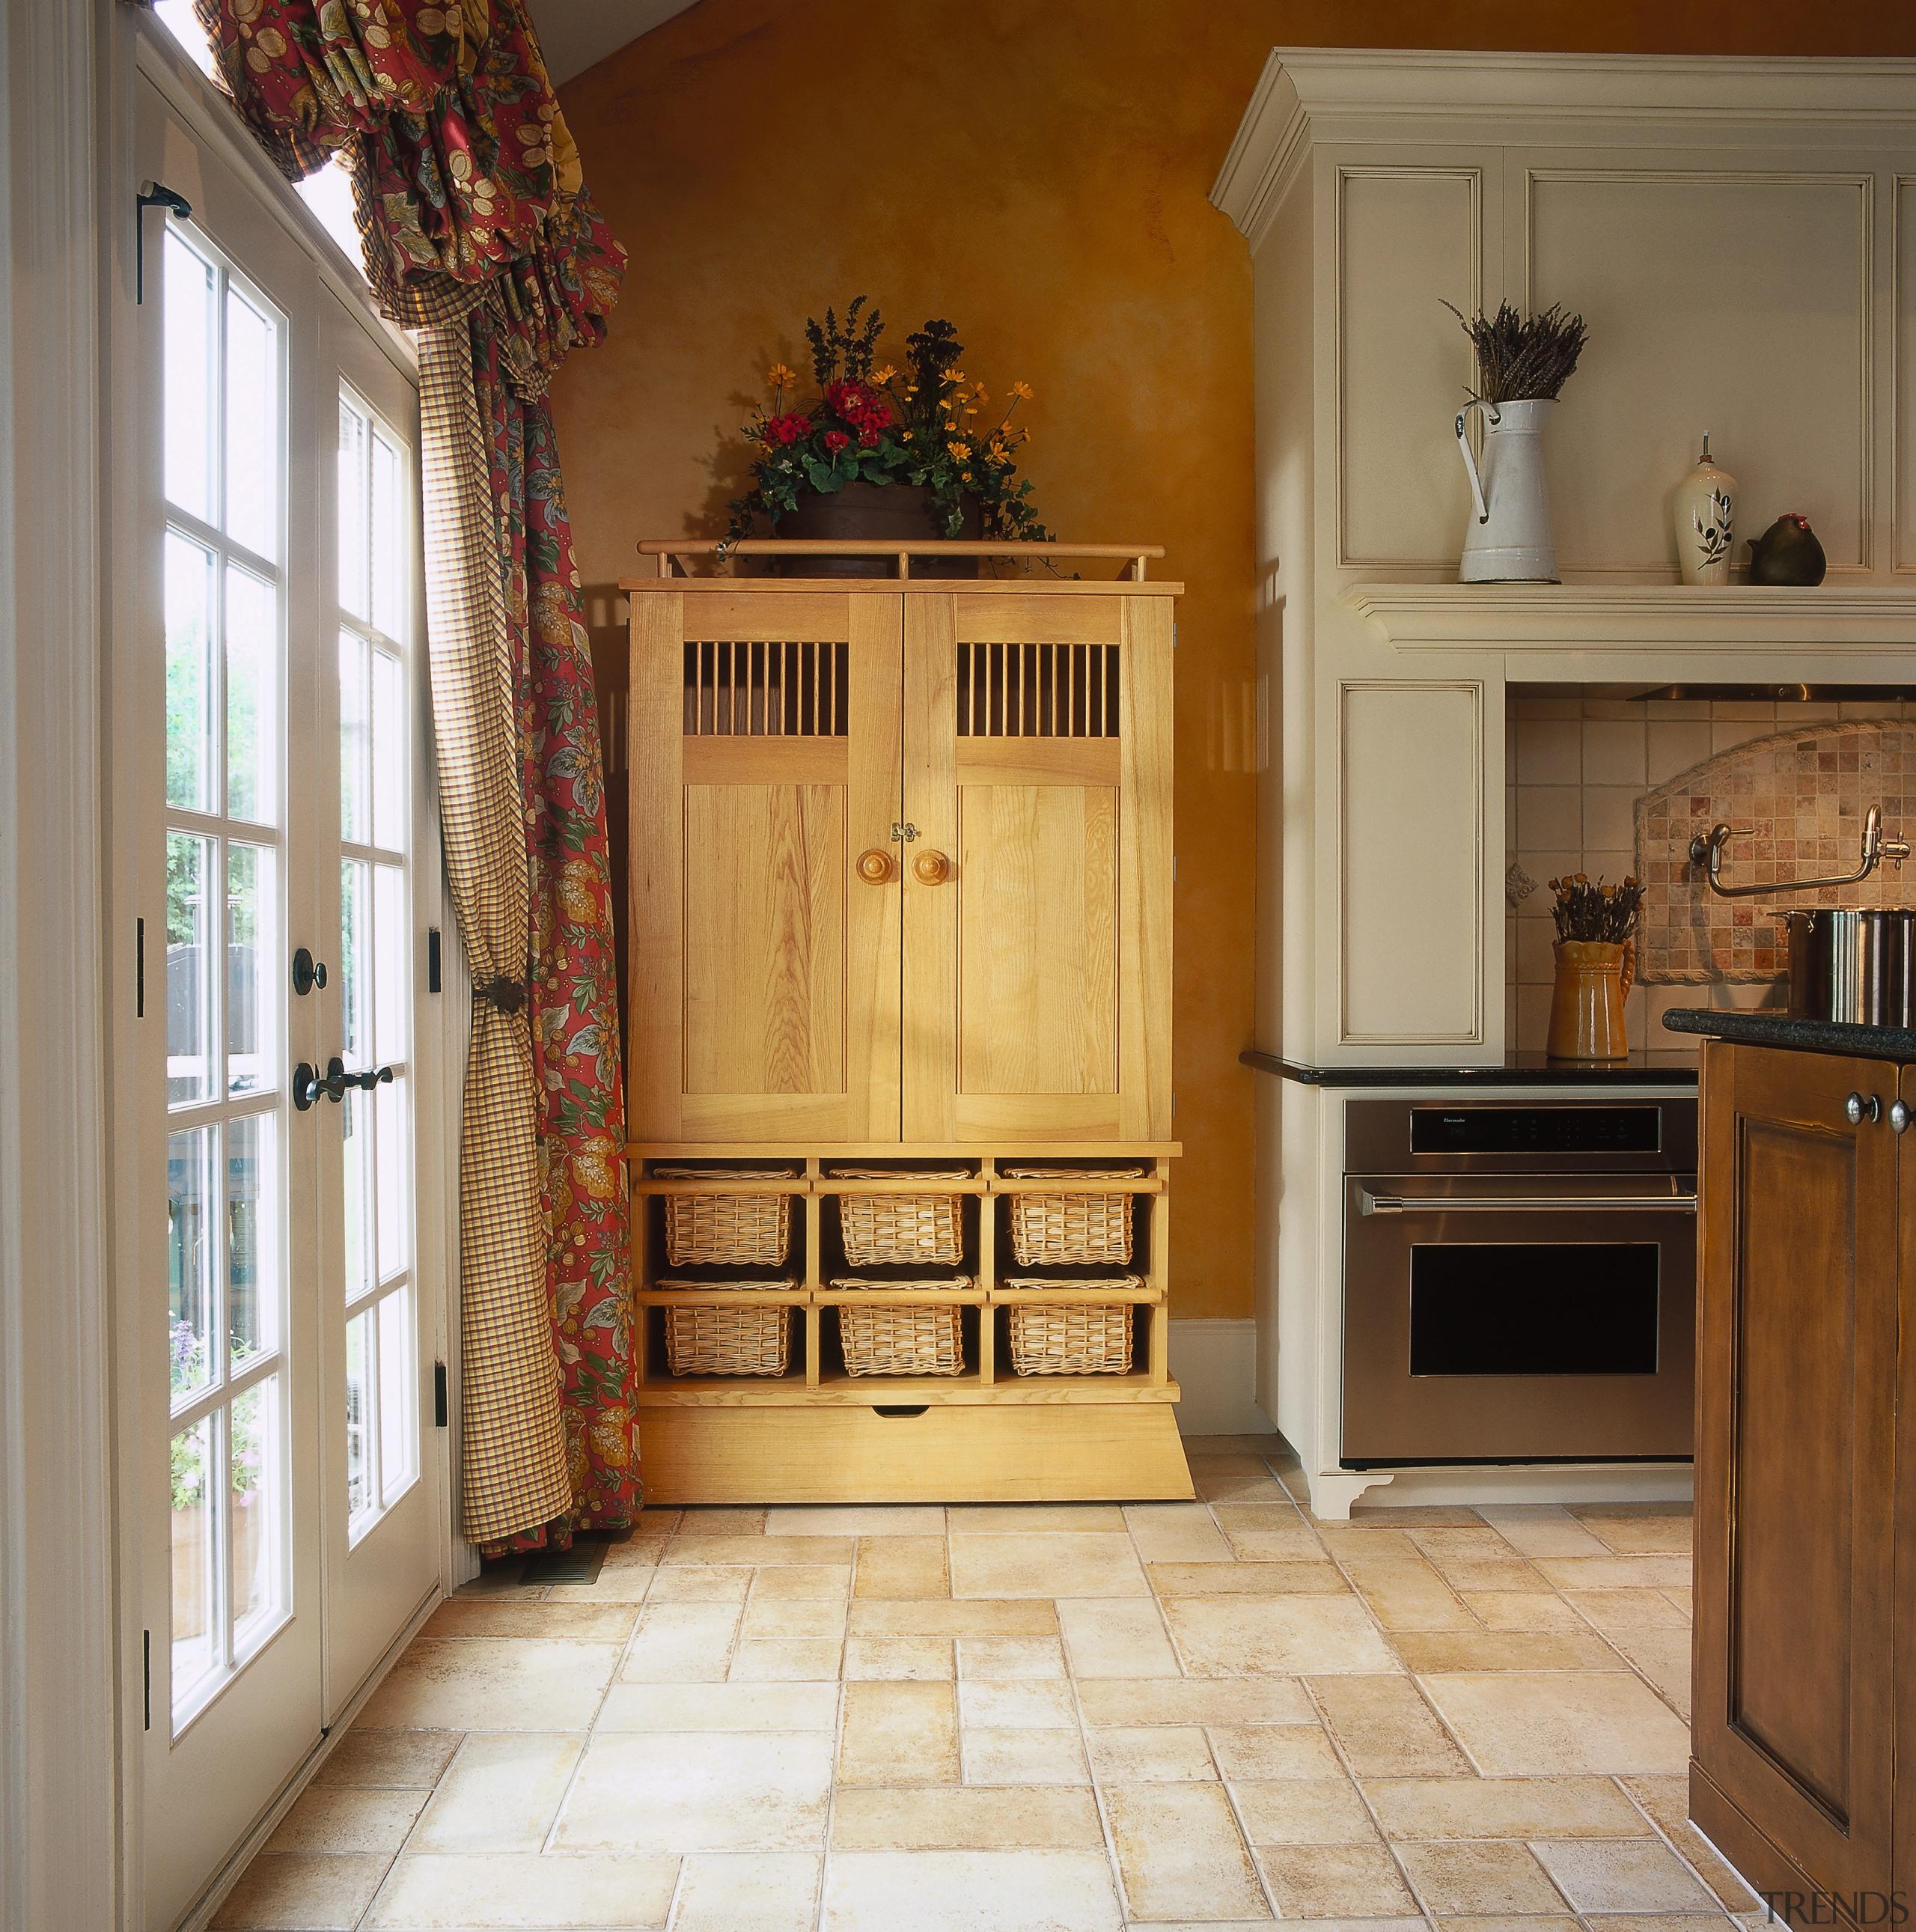 View of the storage unit within this kitchen cabinetry, countertop, door, floor, flooring, furniture, hardwood, home, interior design, kitchen, room, window, brown